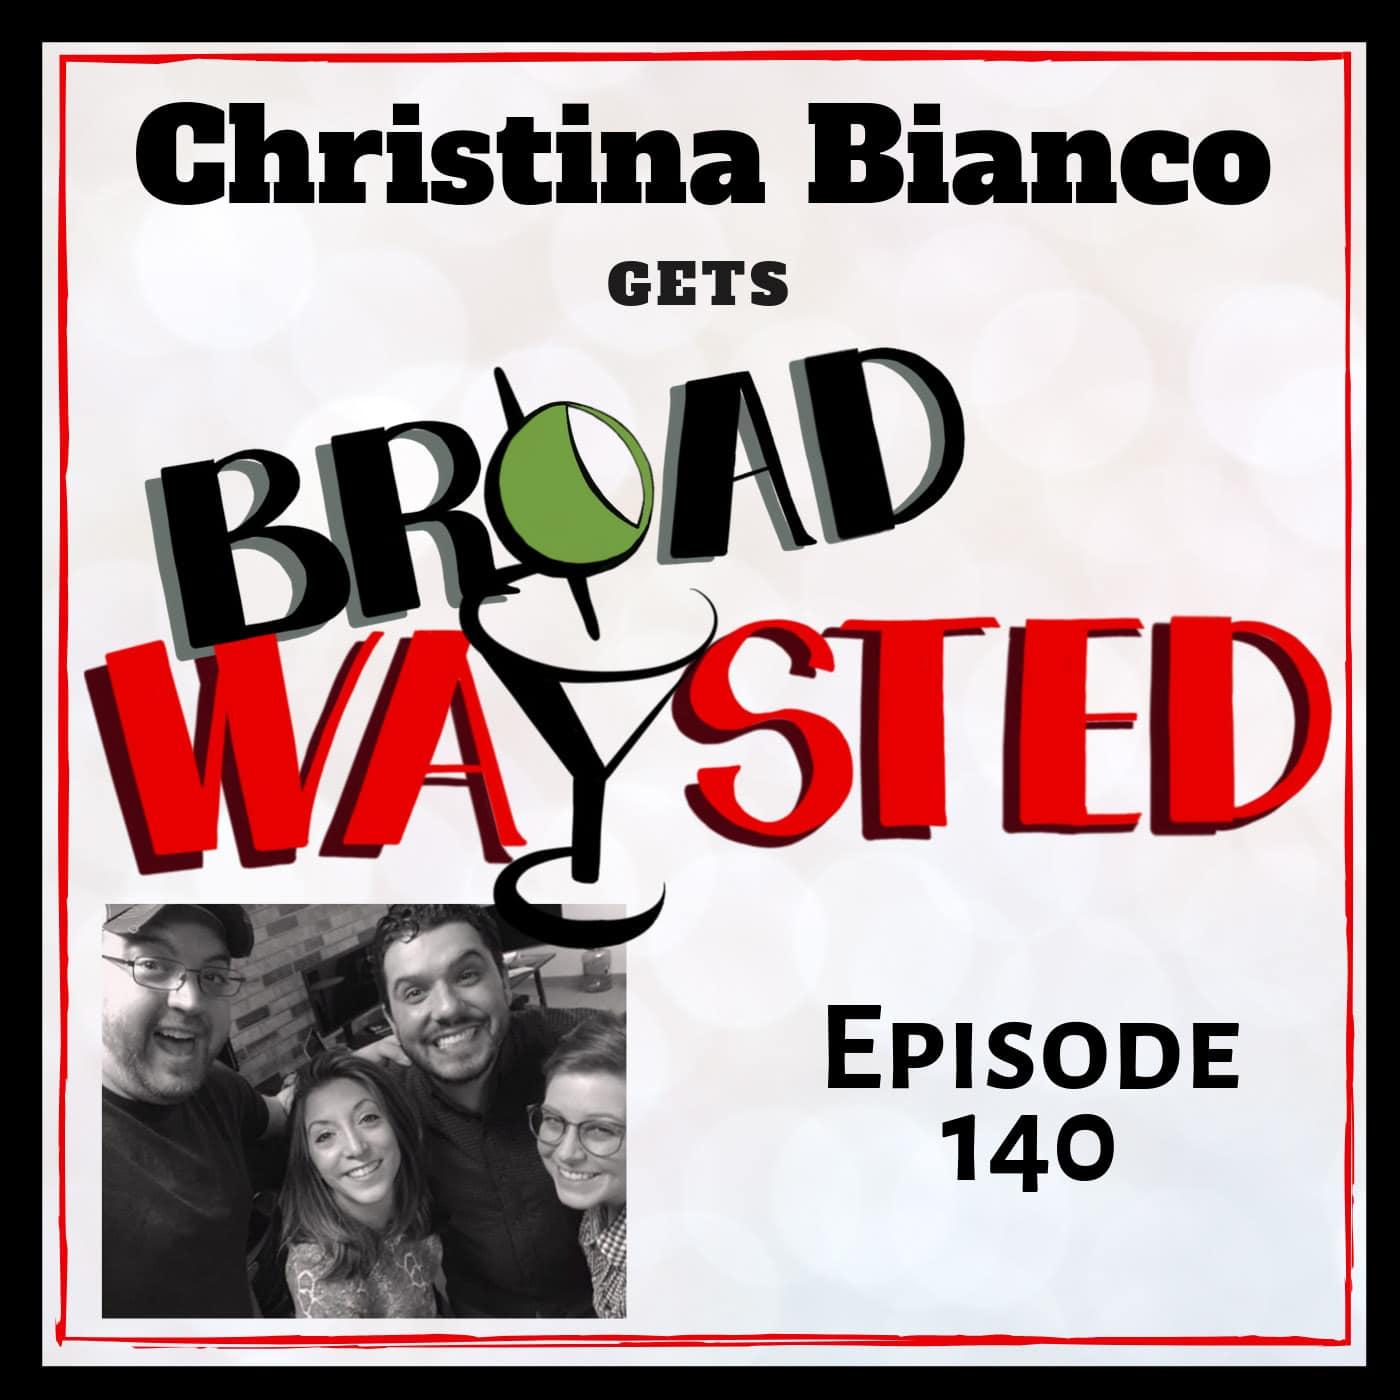 Broadwaysted Ep 140 Christina Bianco